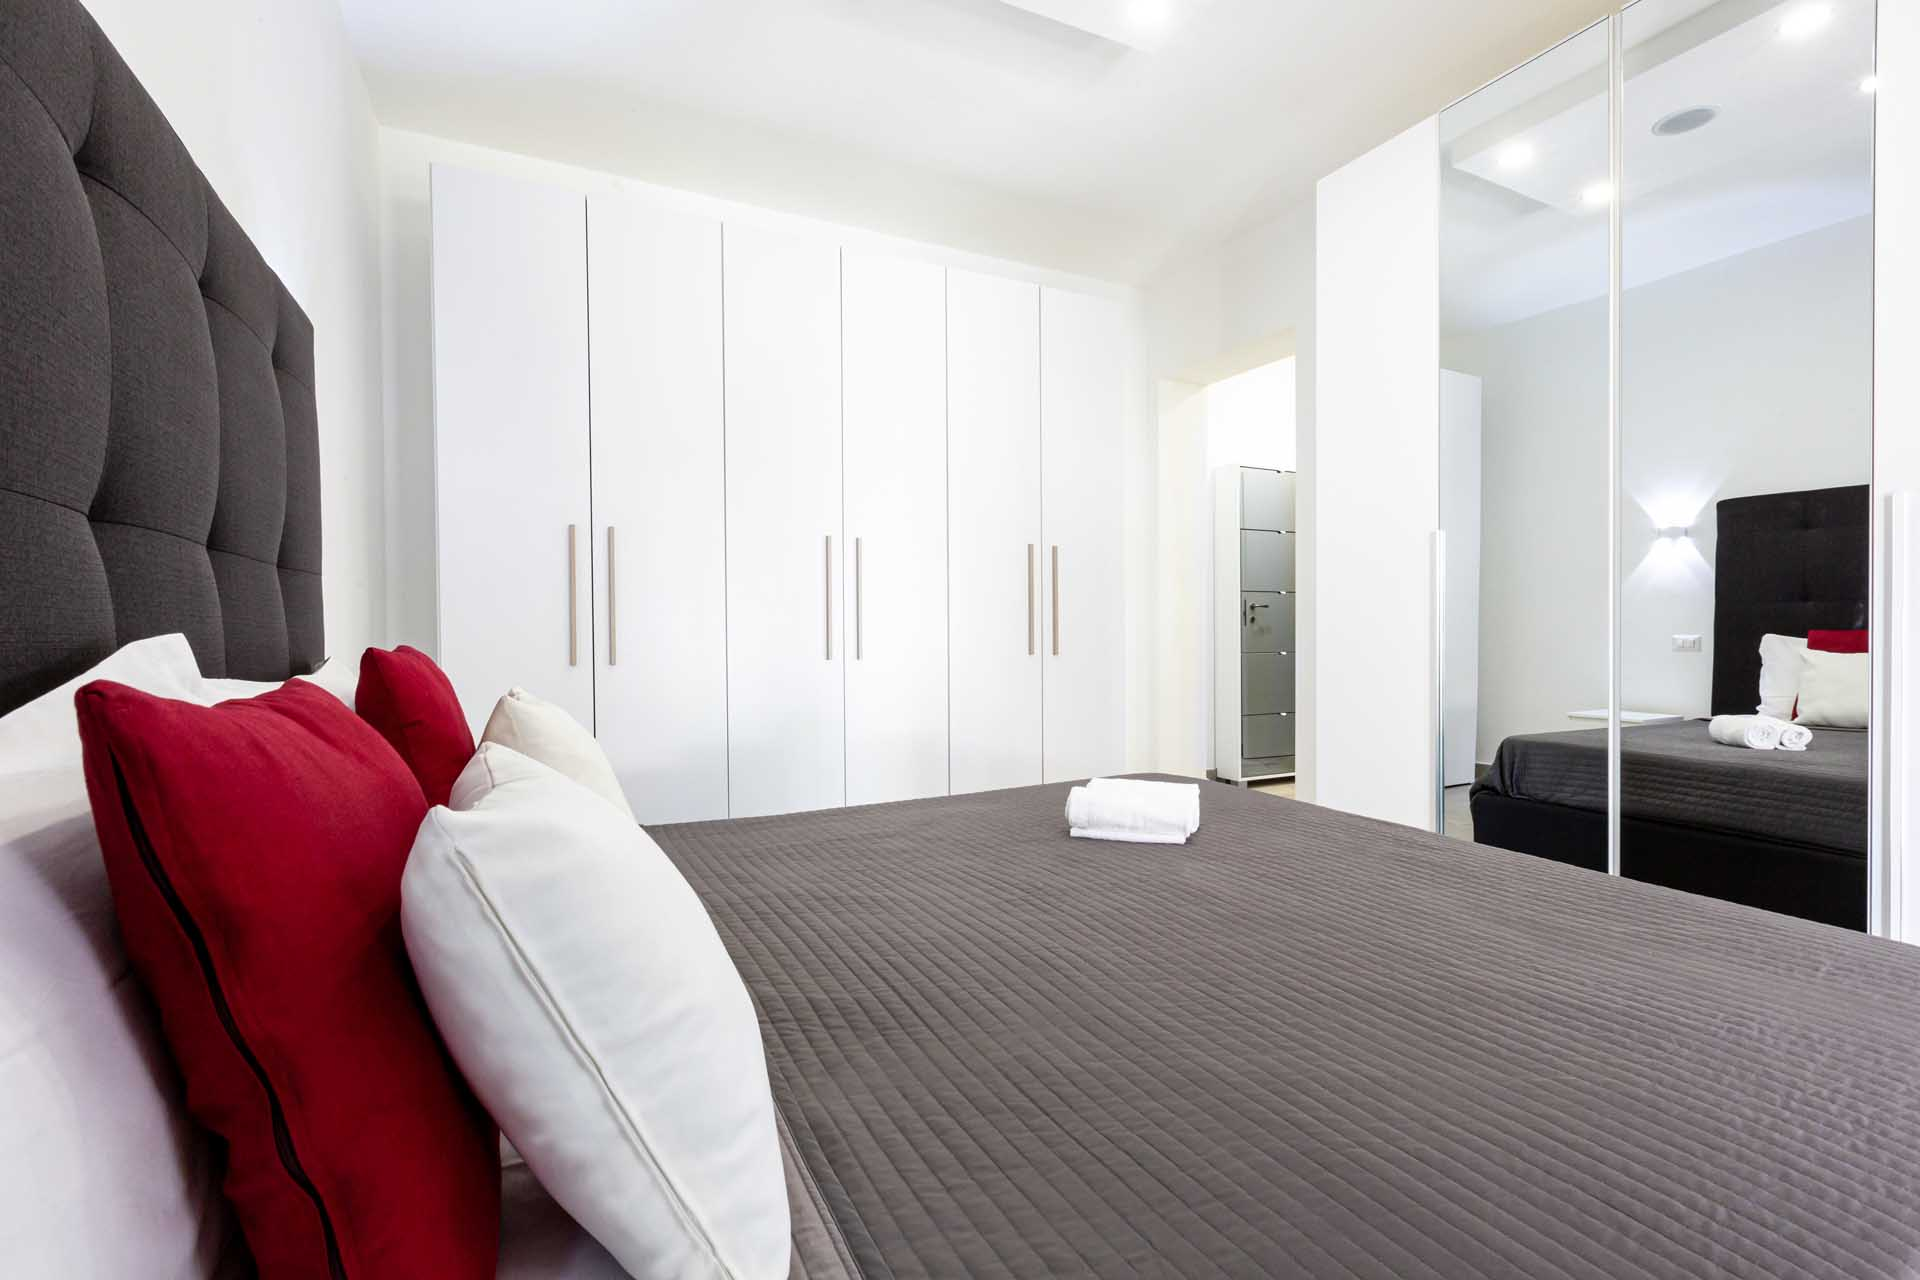 Conny's apartment bedroom